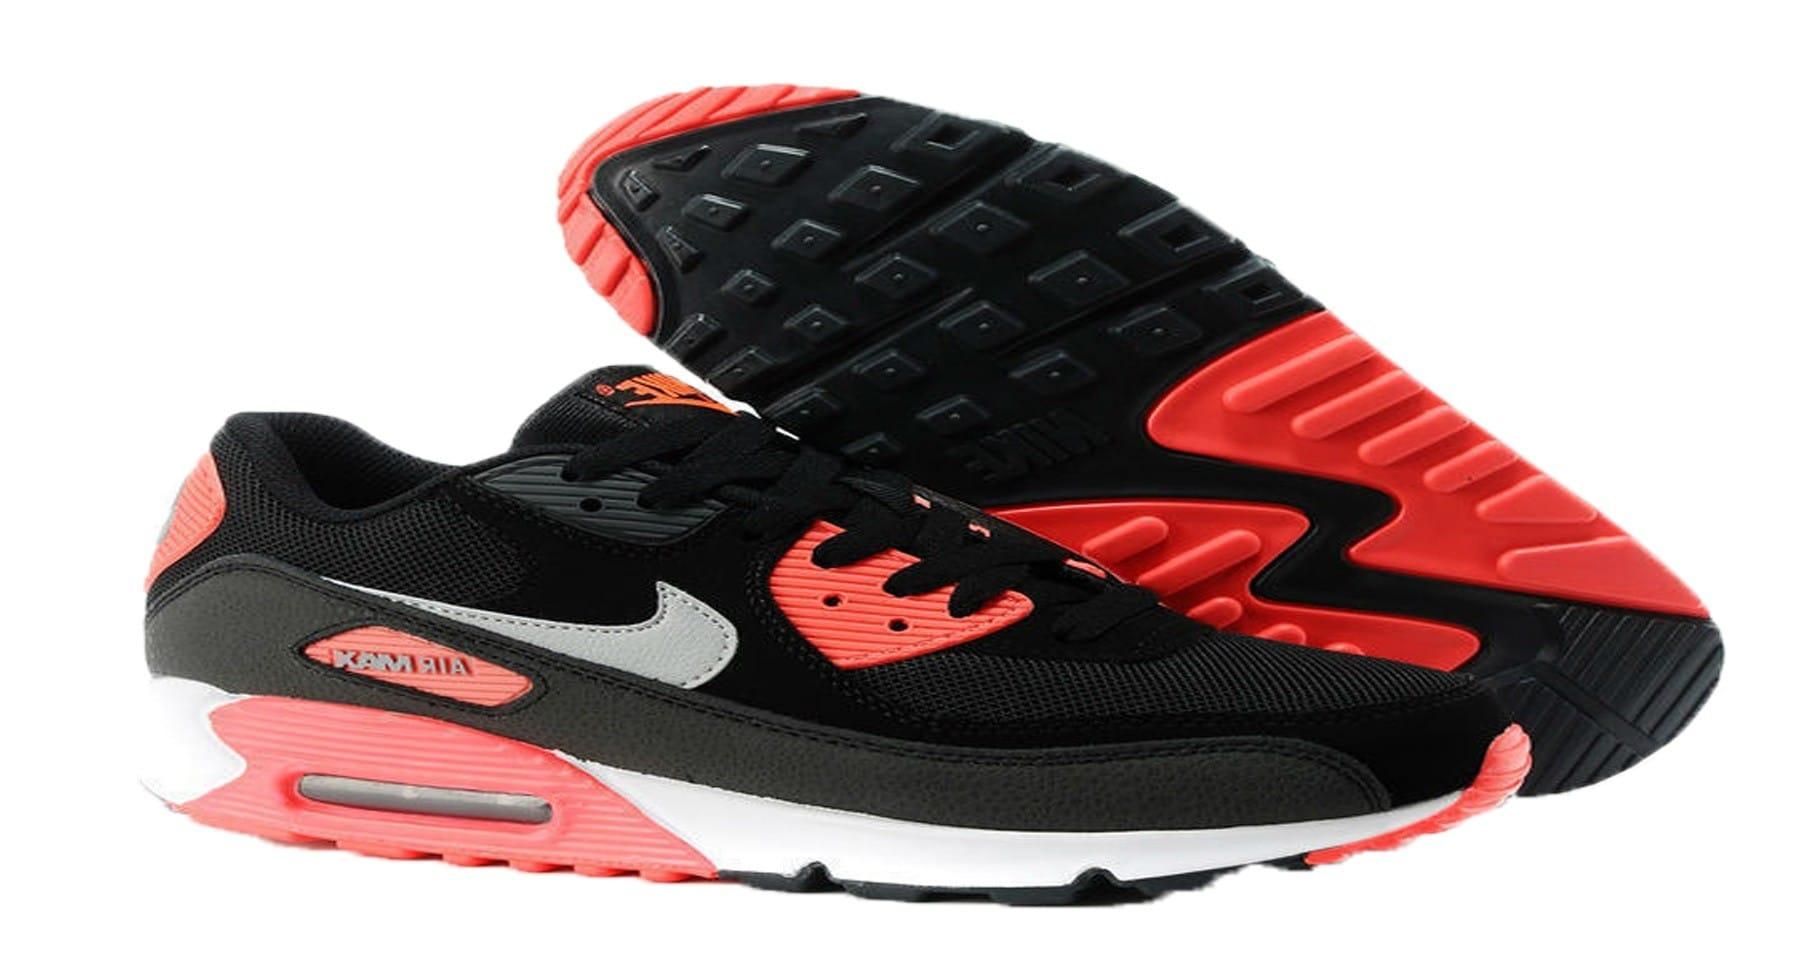 Nike Air Max Negras Y Rojas